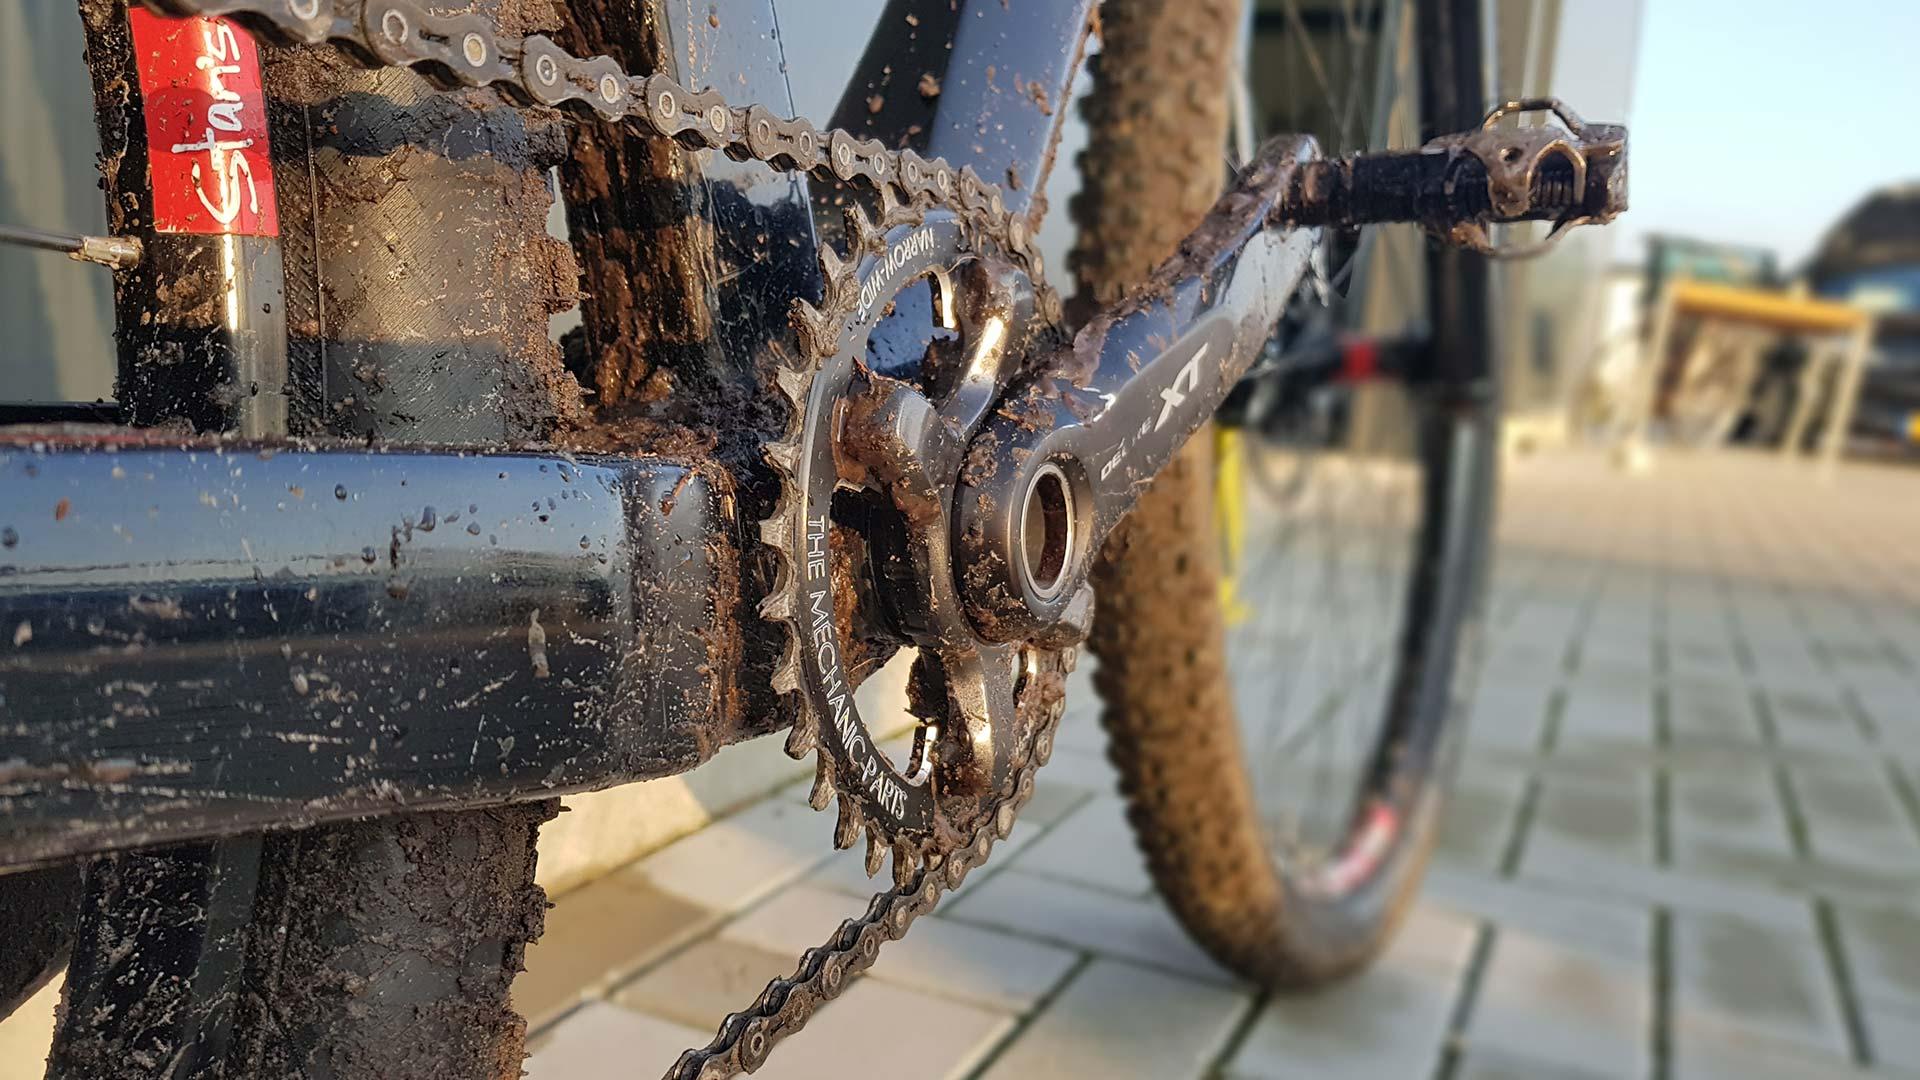 Cycleaning Goirle: laat je fiets professioneel reinigen